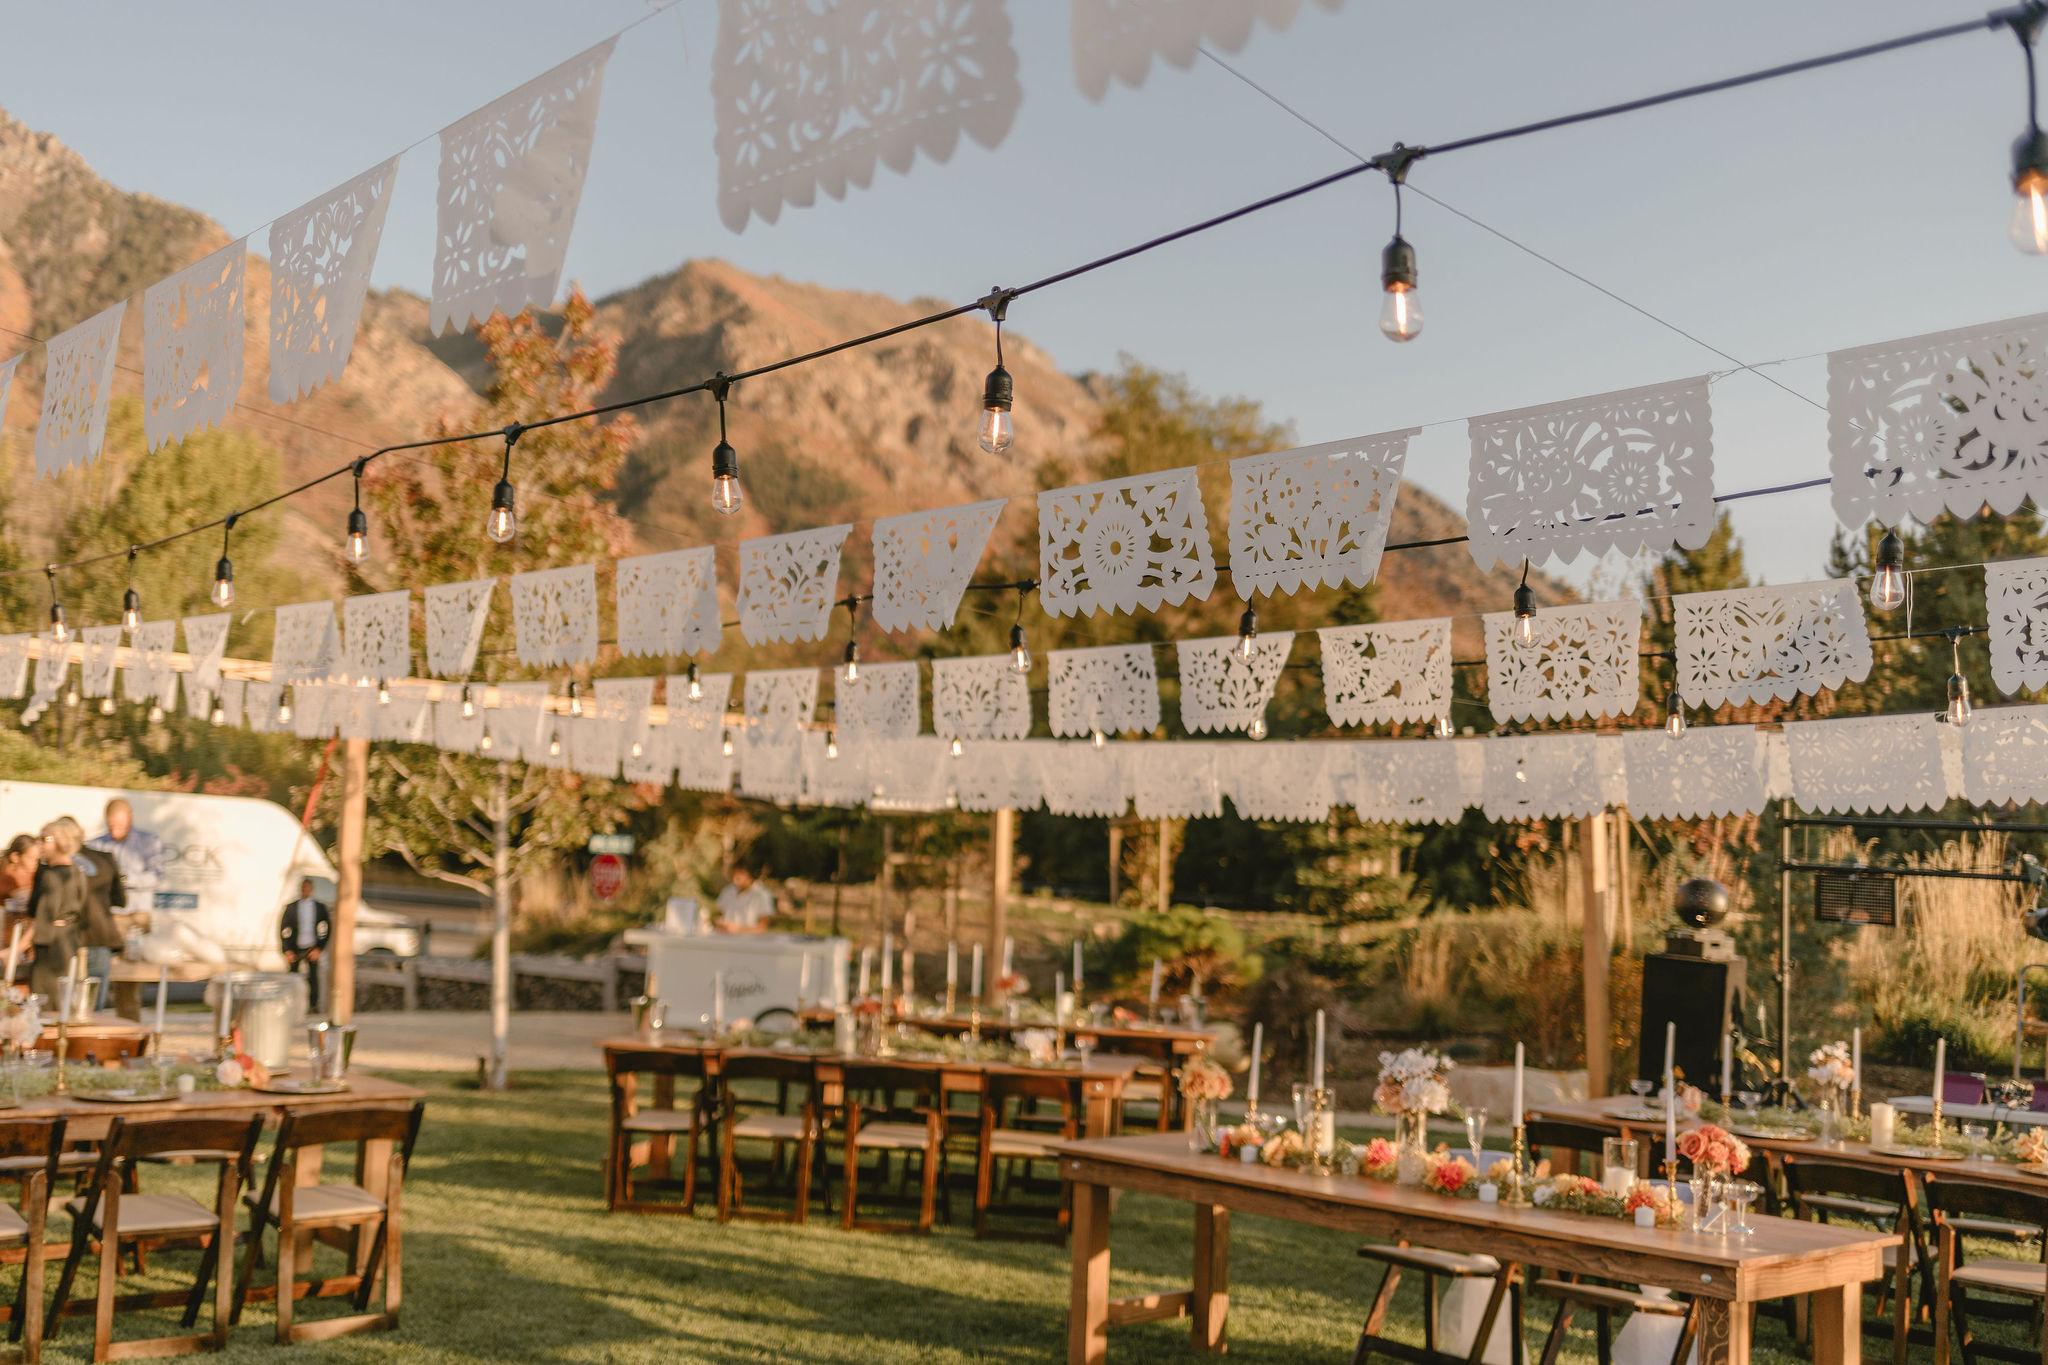 Papel Picado Wedding Banners Eco Friendly Backyard Summer Wedding Princess Kaiulani Tabernero 3